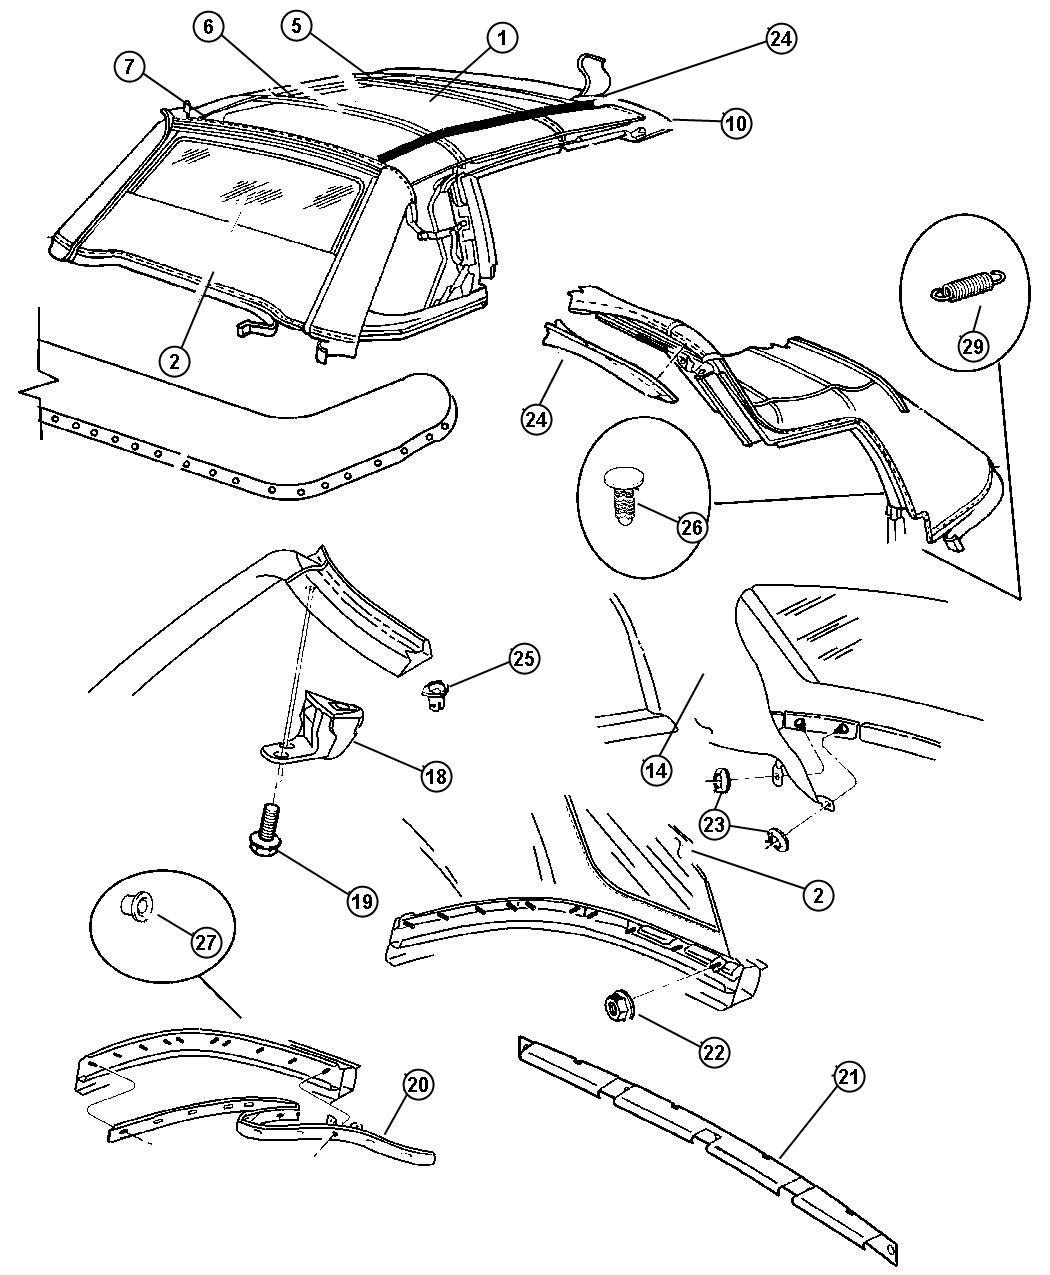 suzuki samurai frame diagram